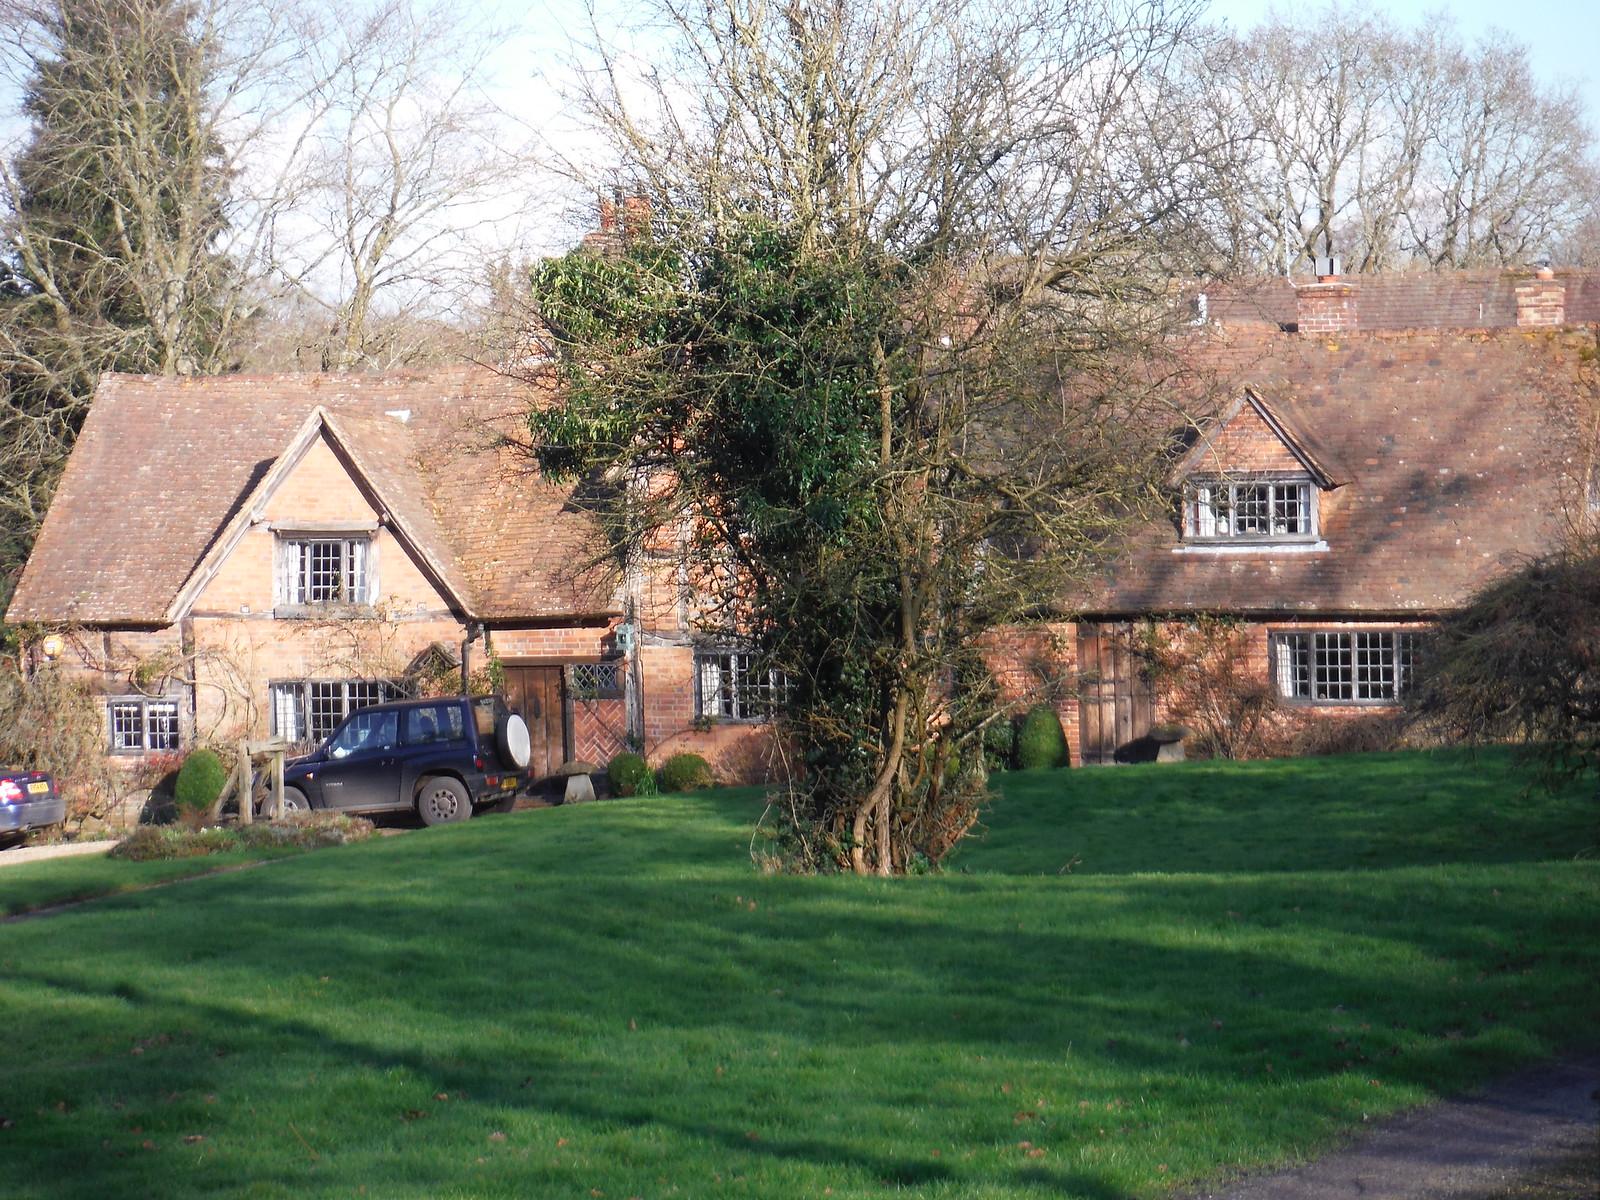 Timber-framed House, Upper Bucklebury SWC Walk 117 Aldermaston to Woolhampton (via Stanford Dingley)